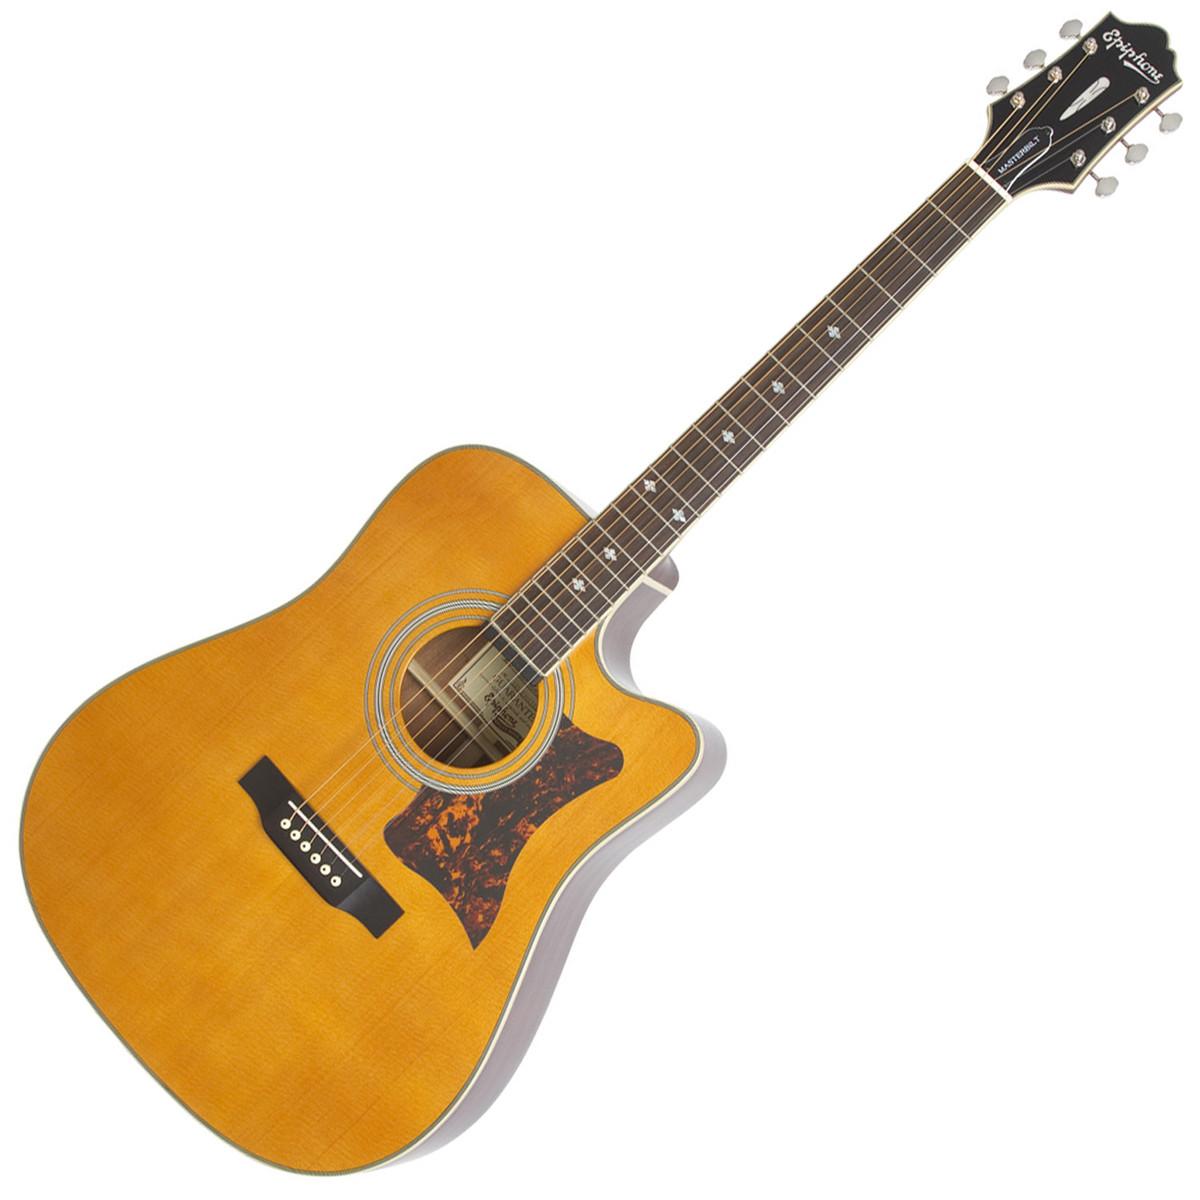 epiphone dr 500mce masterbilt electro acoustic guitar natural b stock at. Black Bedroom Furniture Sets. Home Design Ideas